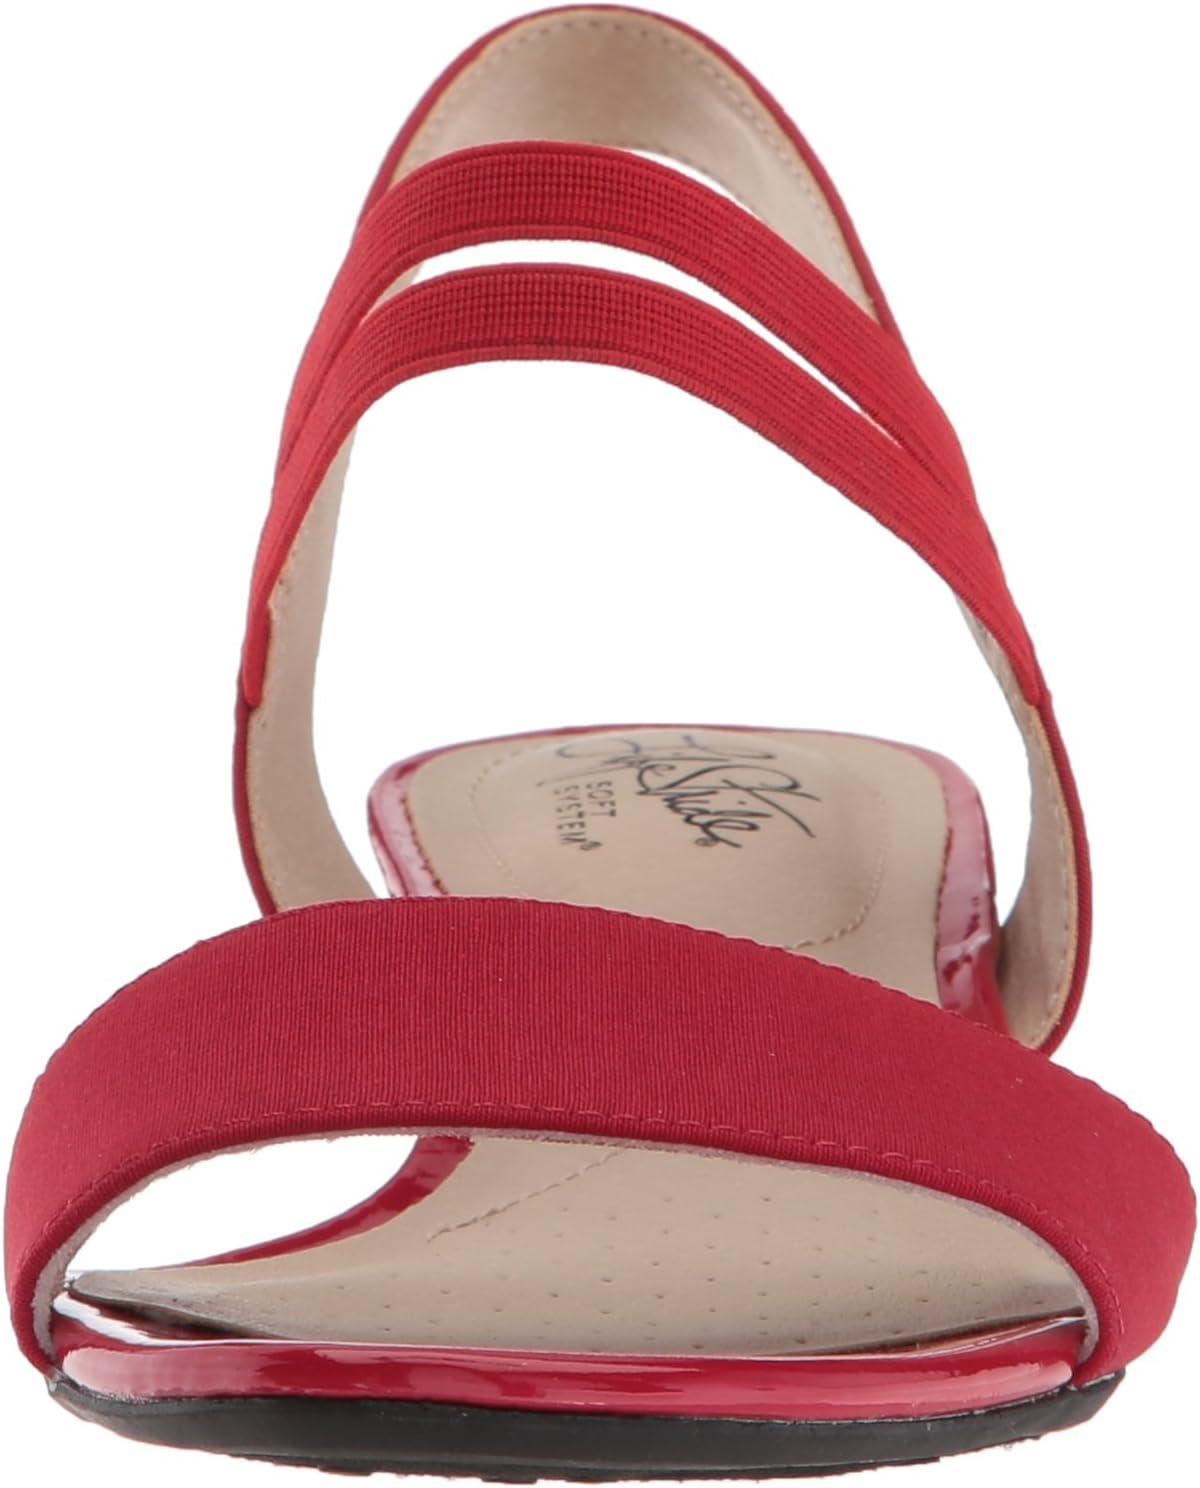 LifeStride dames Yolo wig sandaal Rood